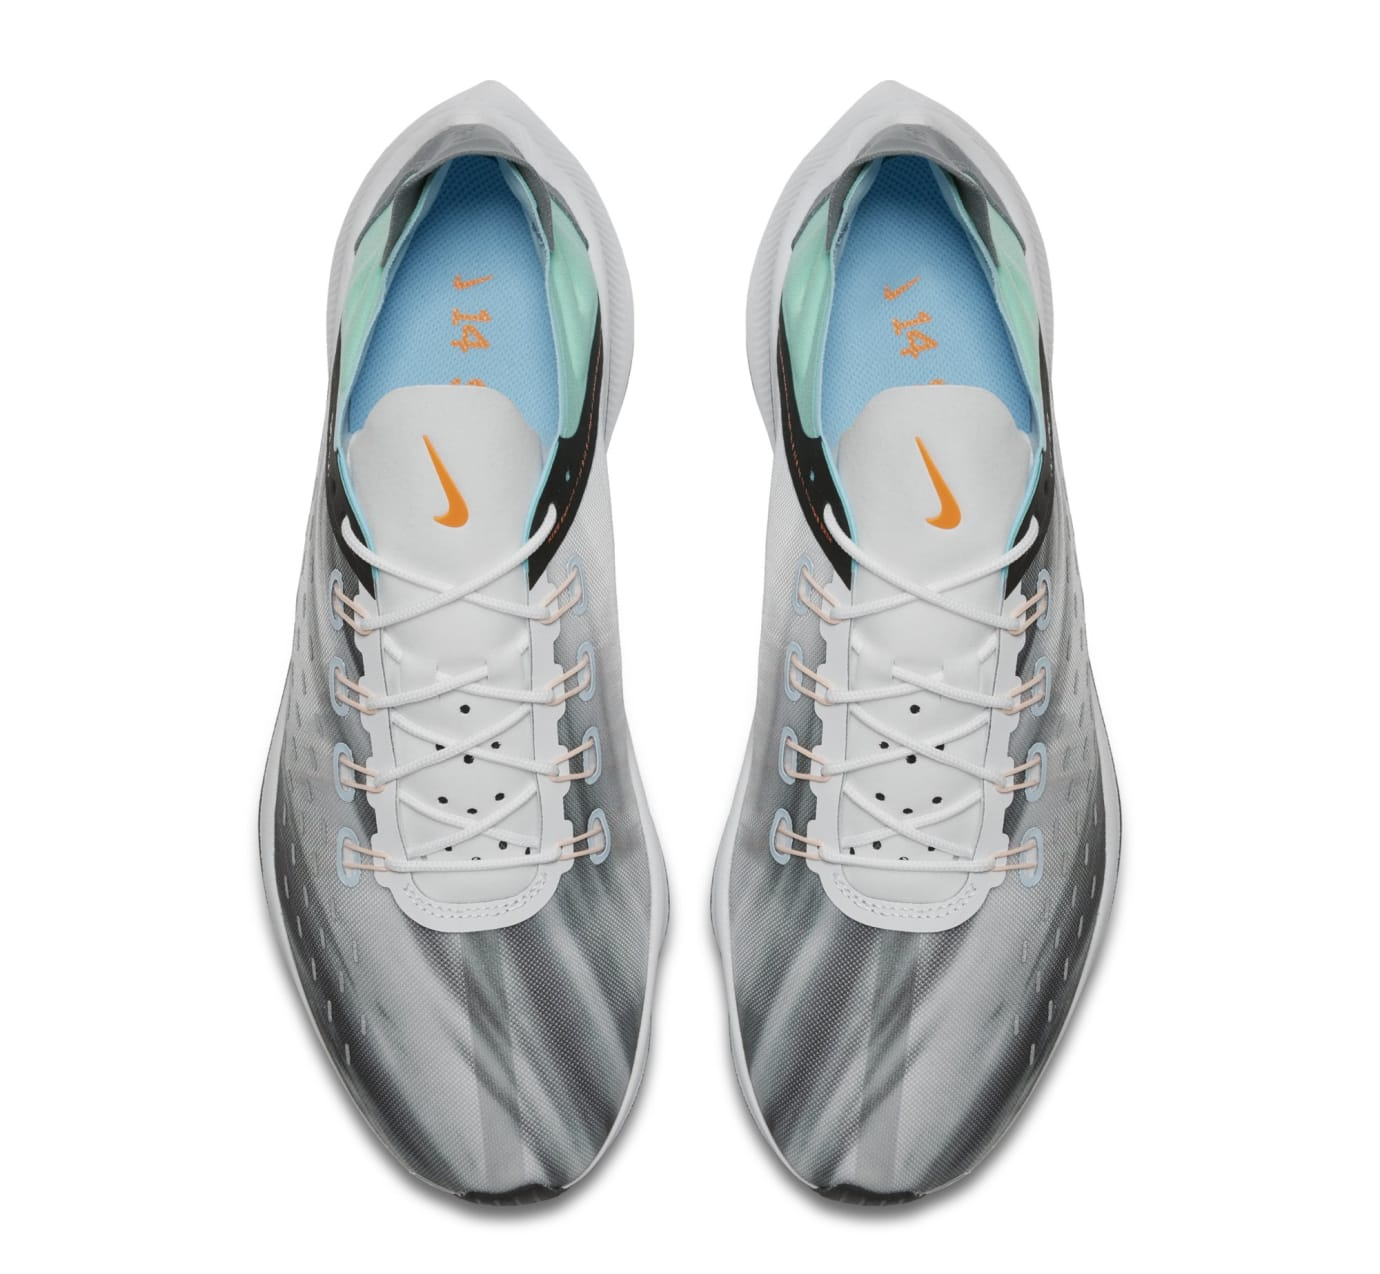 Nike EXP-X14 QS 'White/Emerald Rise/Cone/Blue Chill' BQ6972-100 (Top)